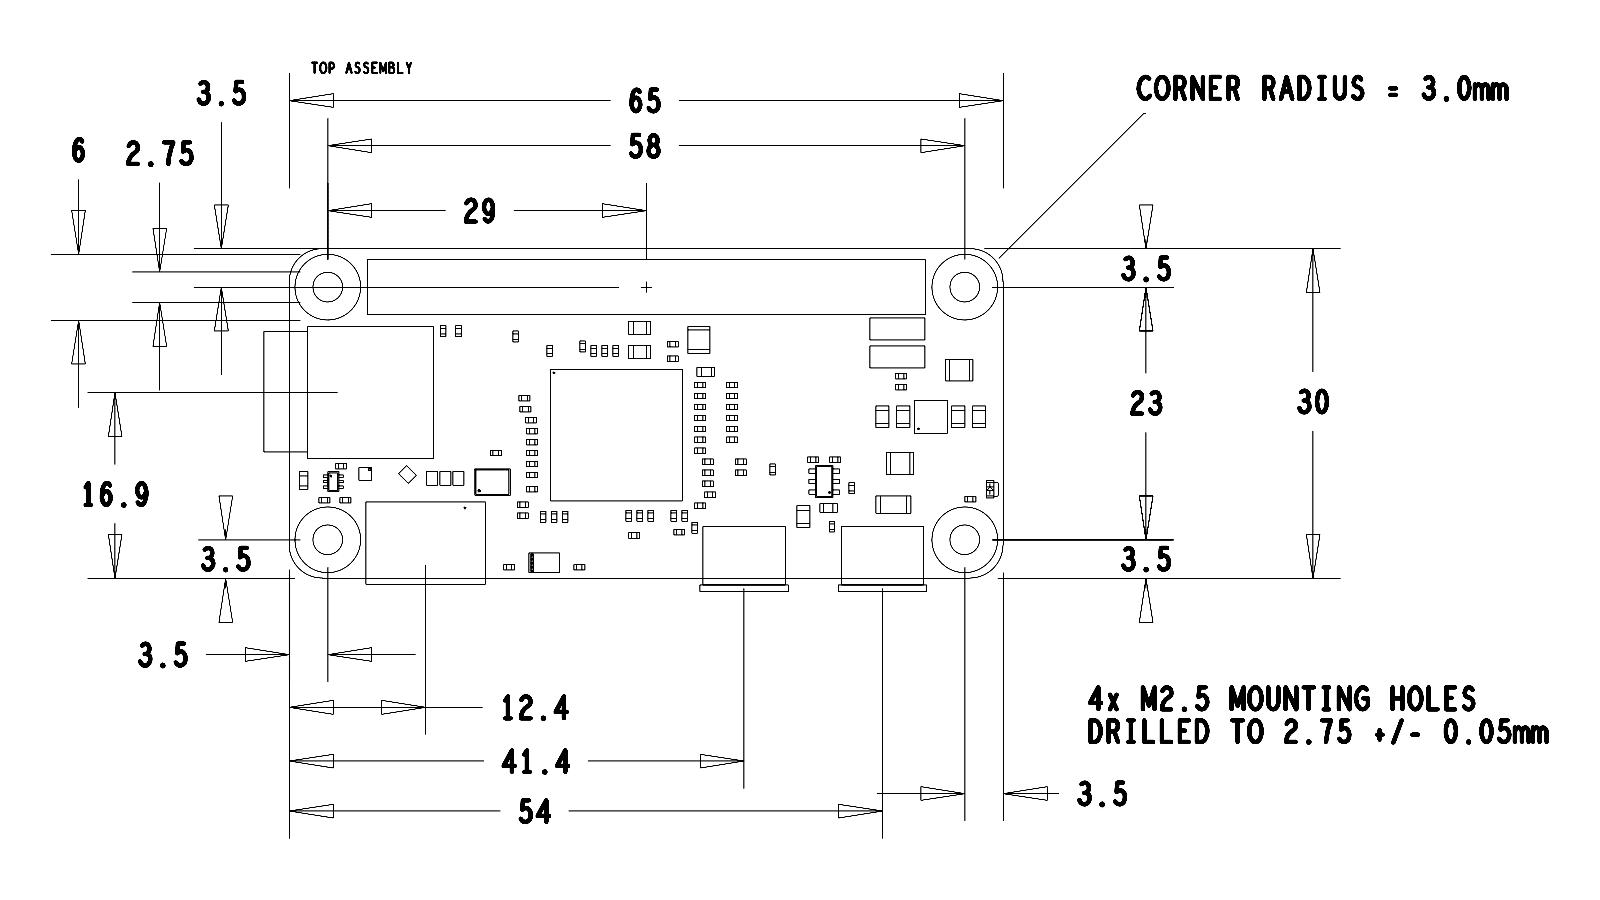 Raspberry Pi Mechanical Drawings & Dimensions - Raspberry Pi Spy